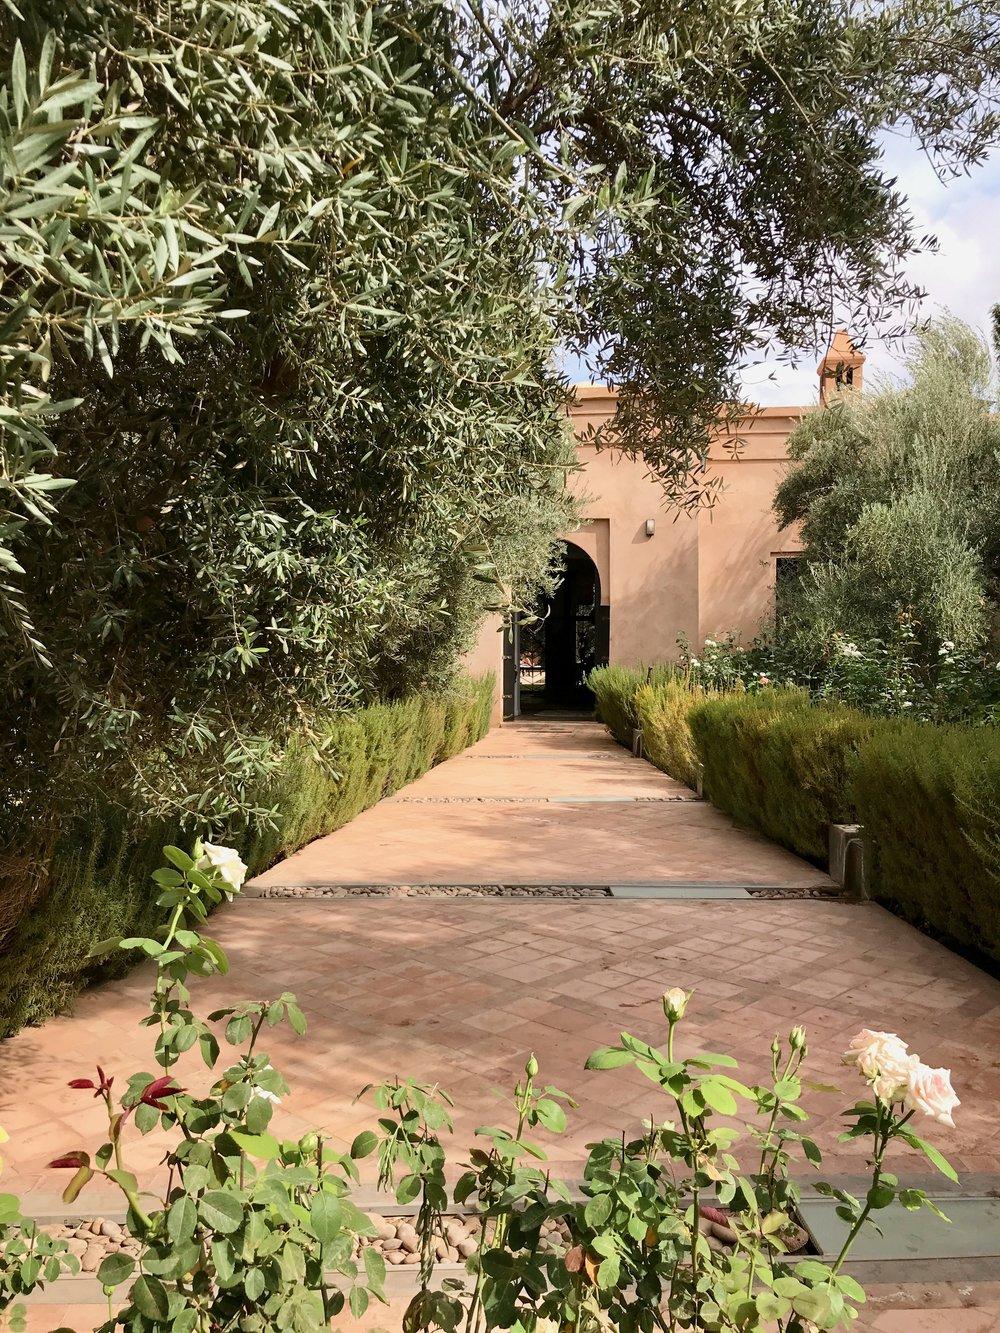 Entryway to Peacock Pavilions. An unfolding secret garden...